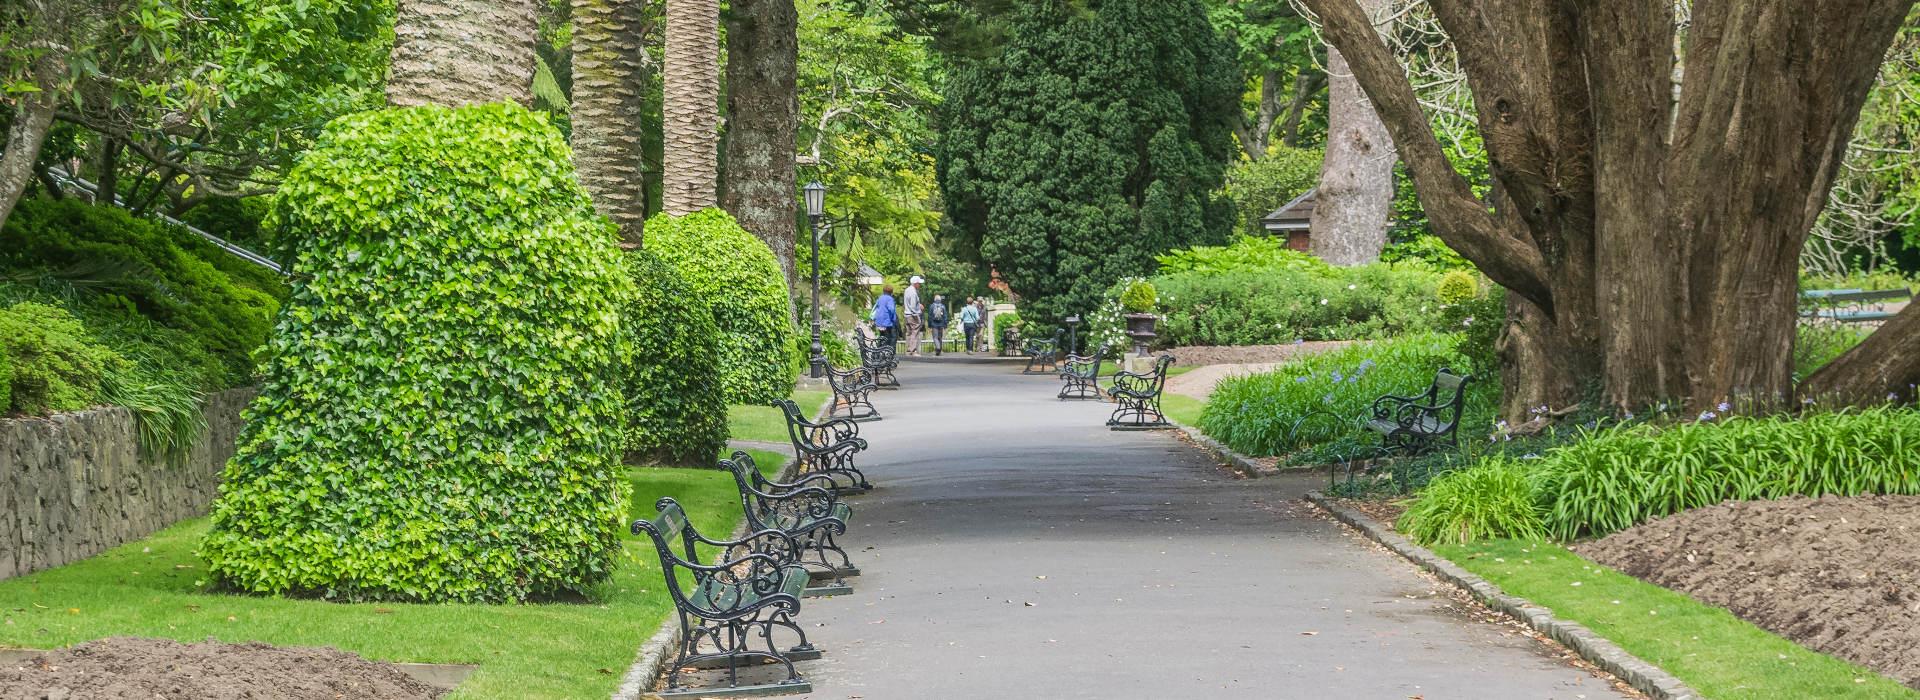 Wellington Botanic Garden @KRZYSZTOF GOLIK